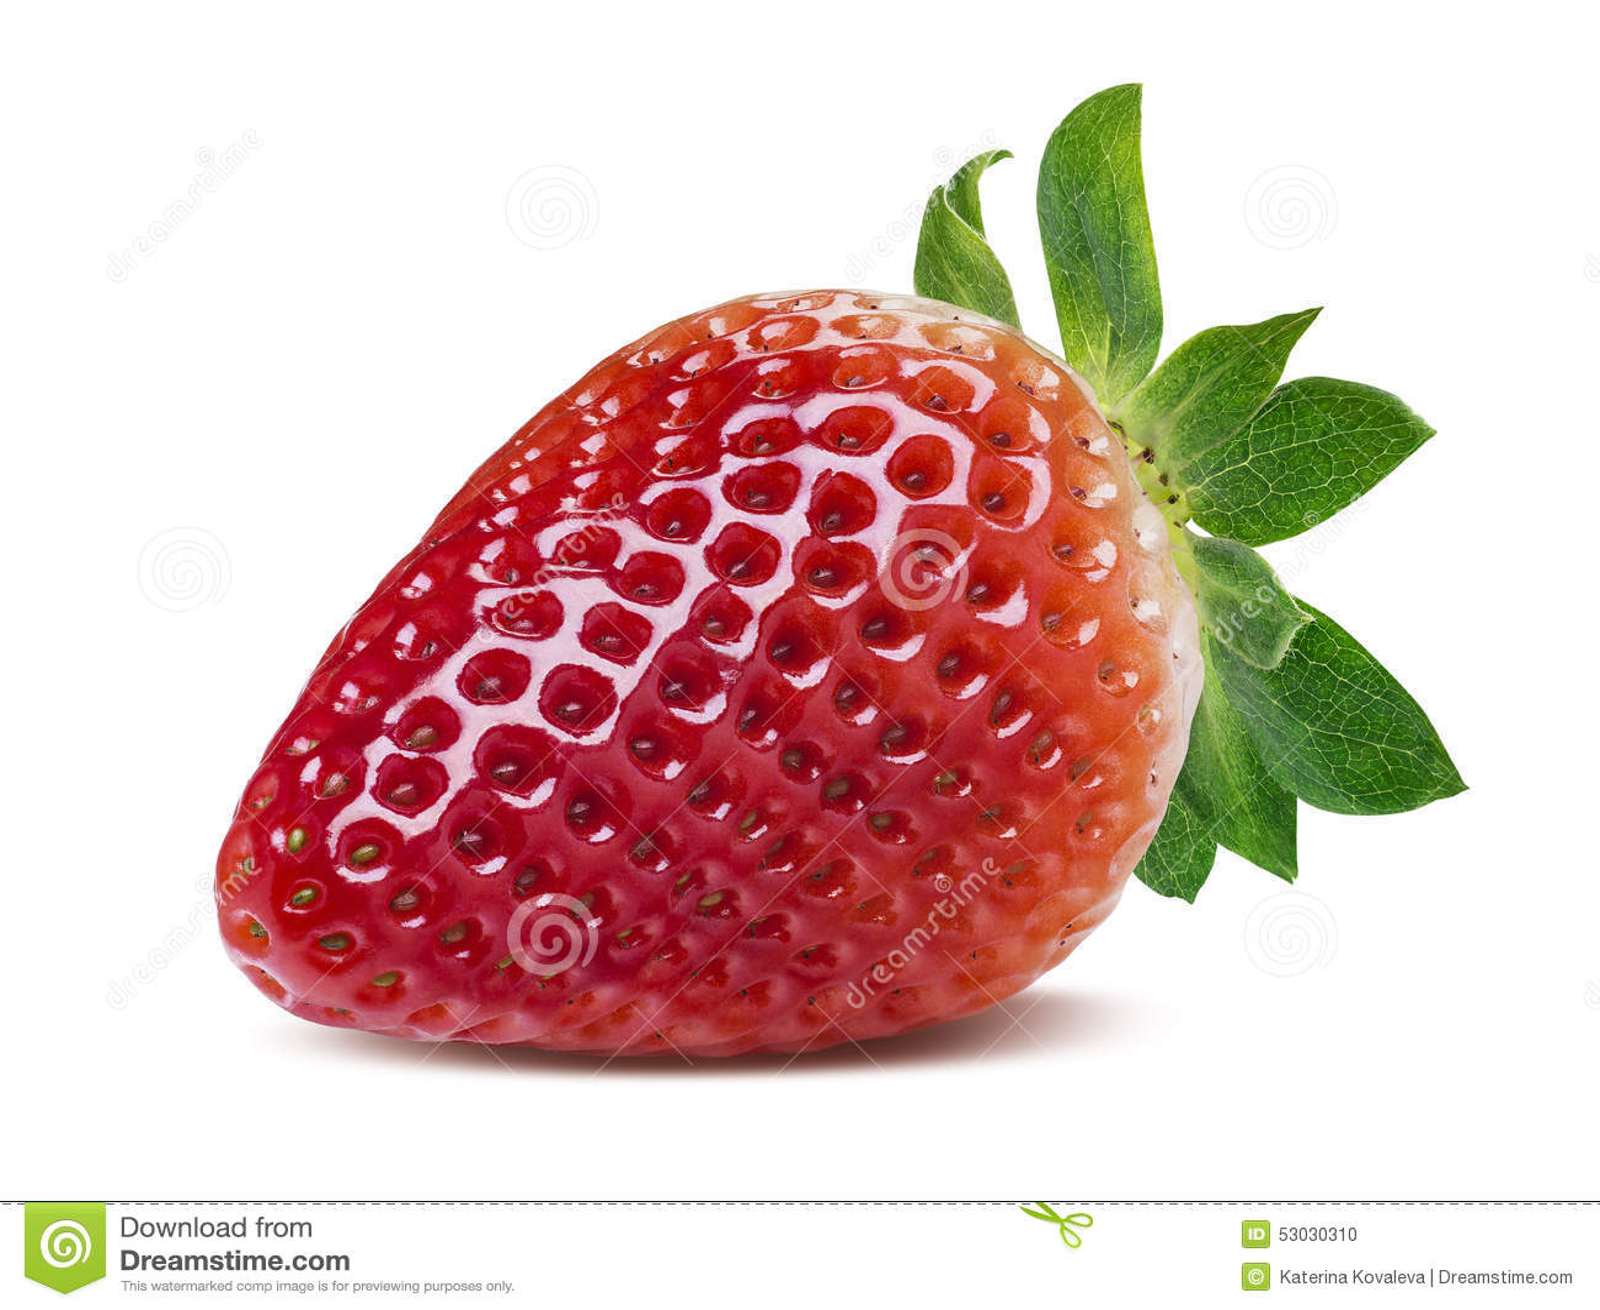 single perfect strawberry isolated on white background